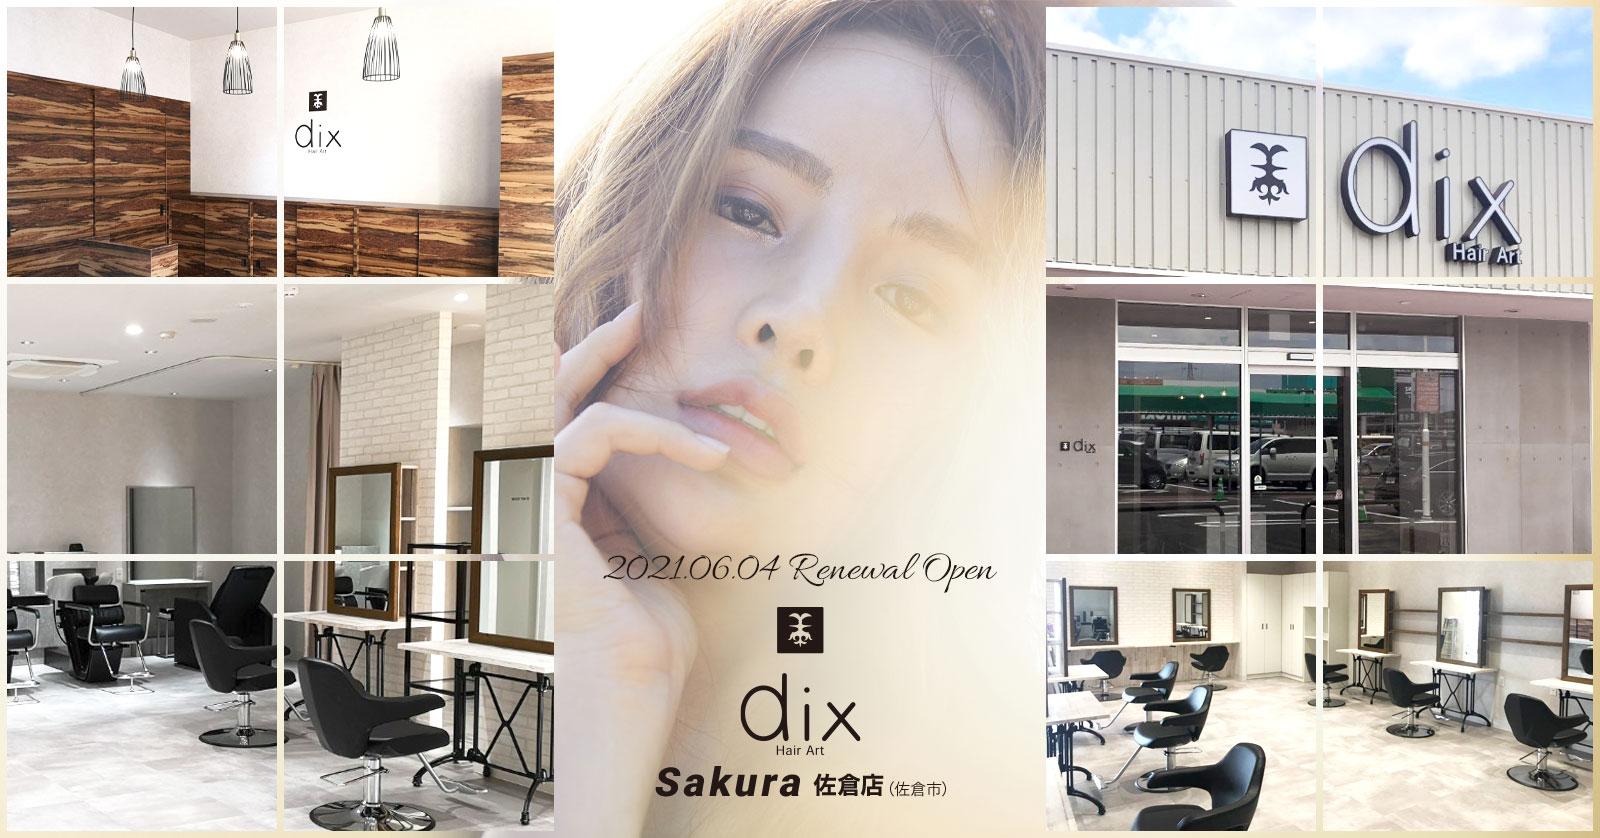 Hair studio CLiC佐倉店